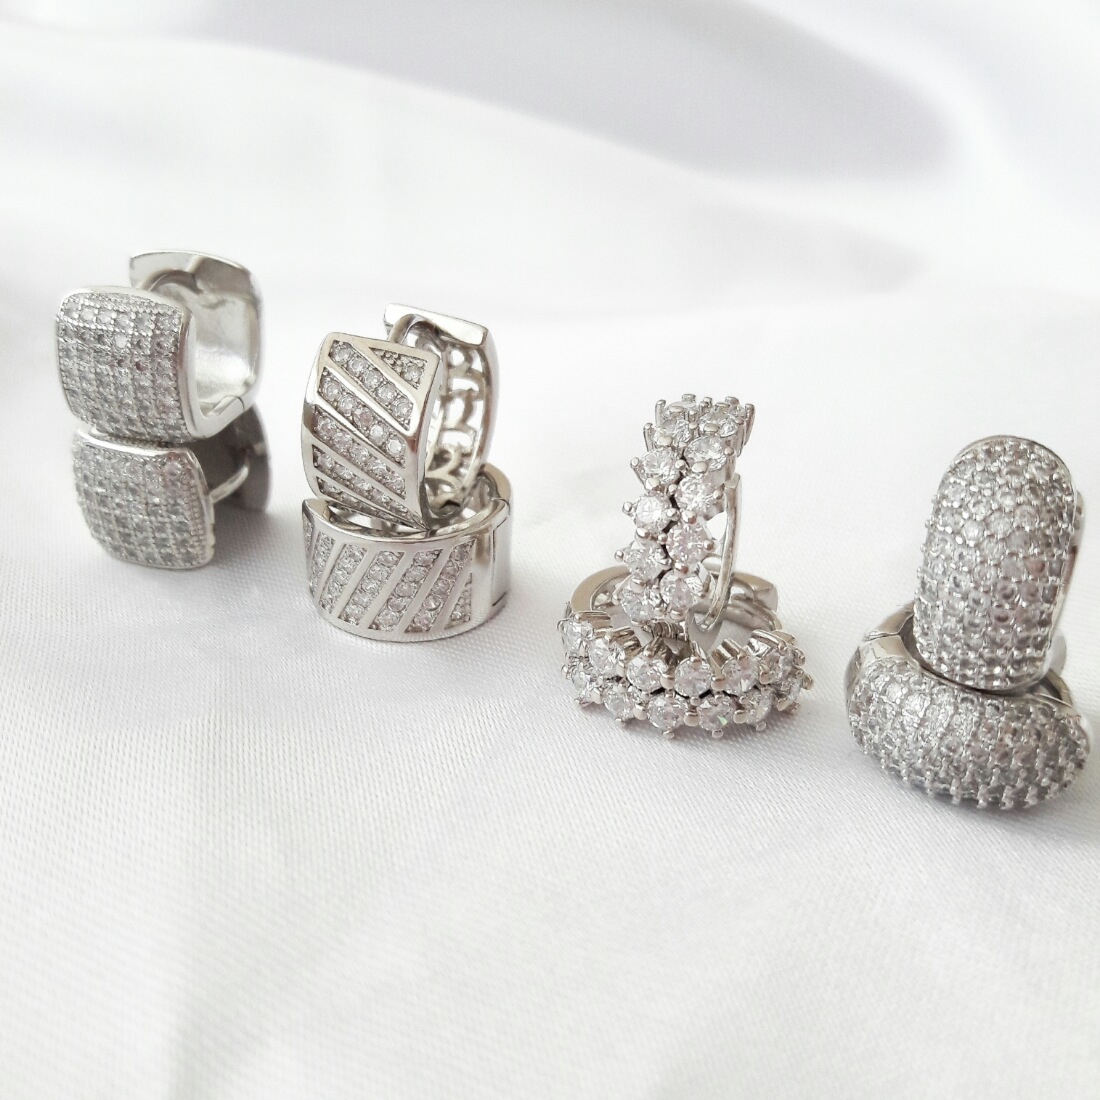 Argola Quadrada Prata Zircônia Cristal Semijoia Ródio Branco  - Soloyou